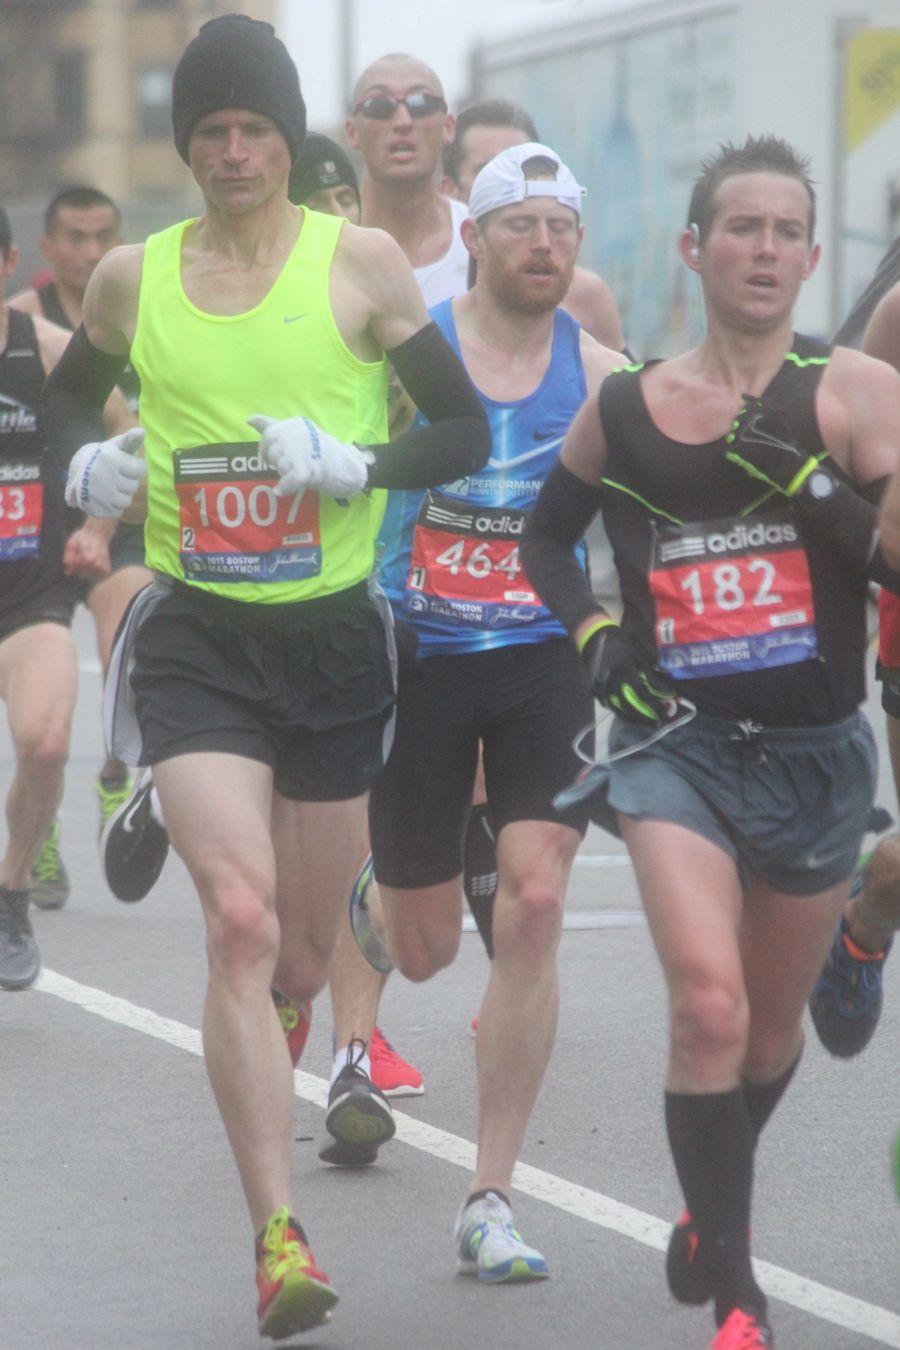 boston marathon april 20 2015 racer number 1007